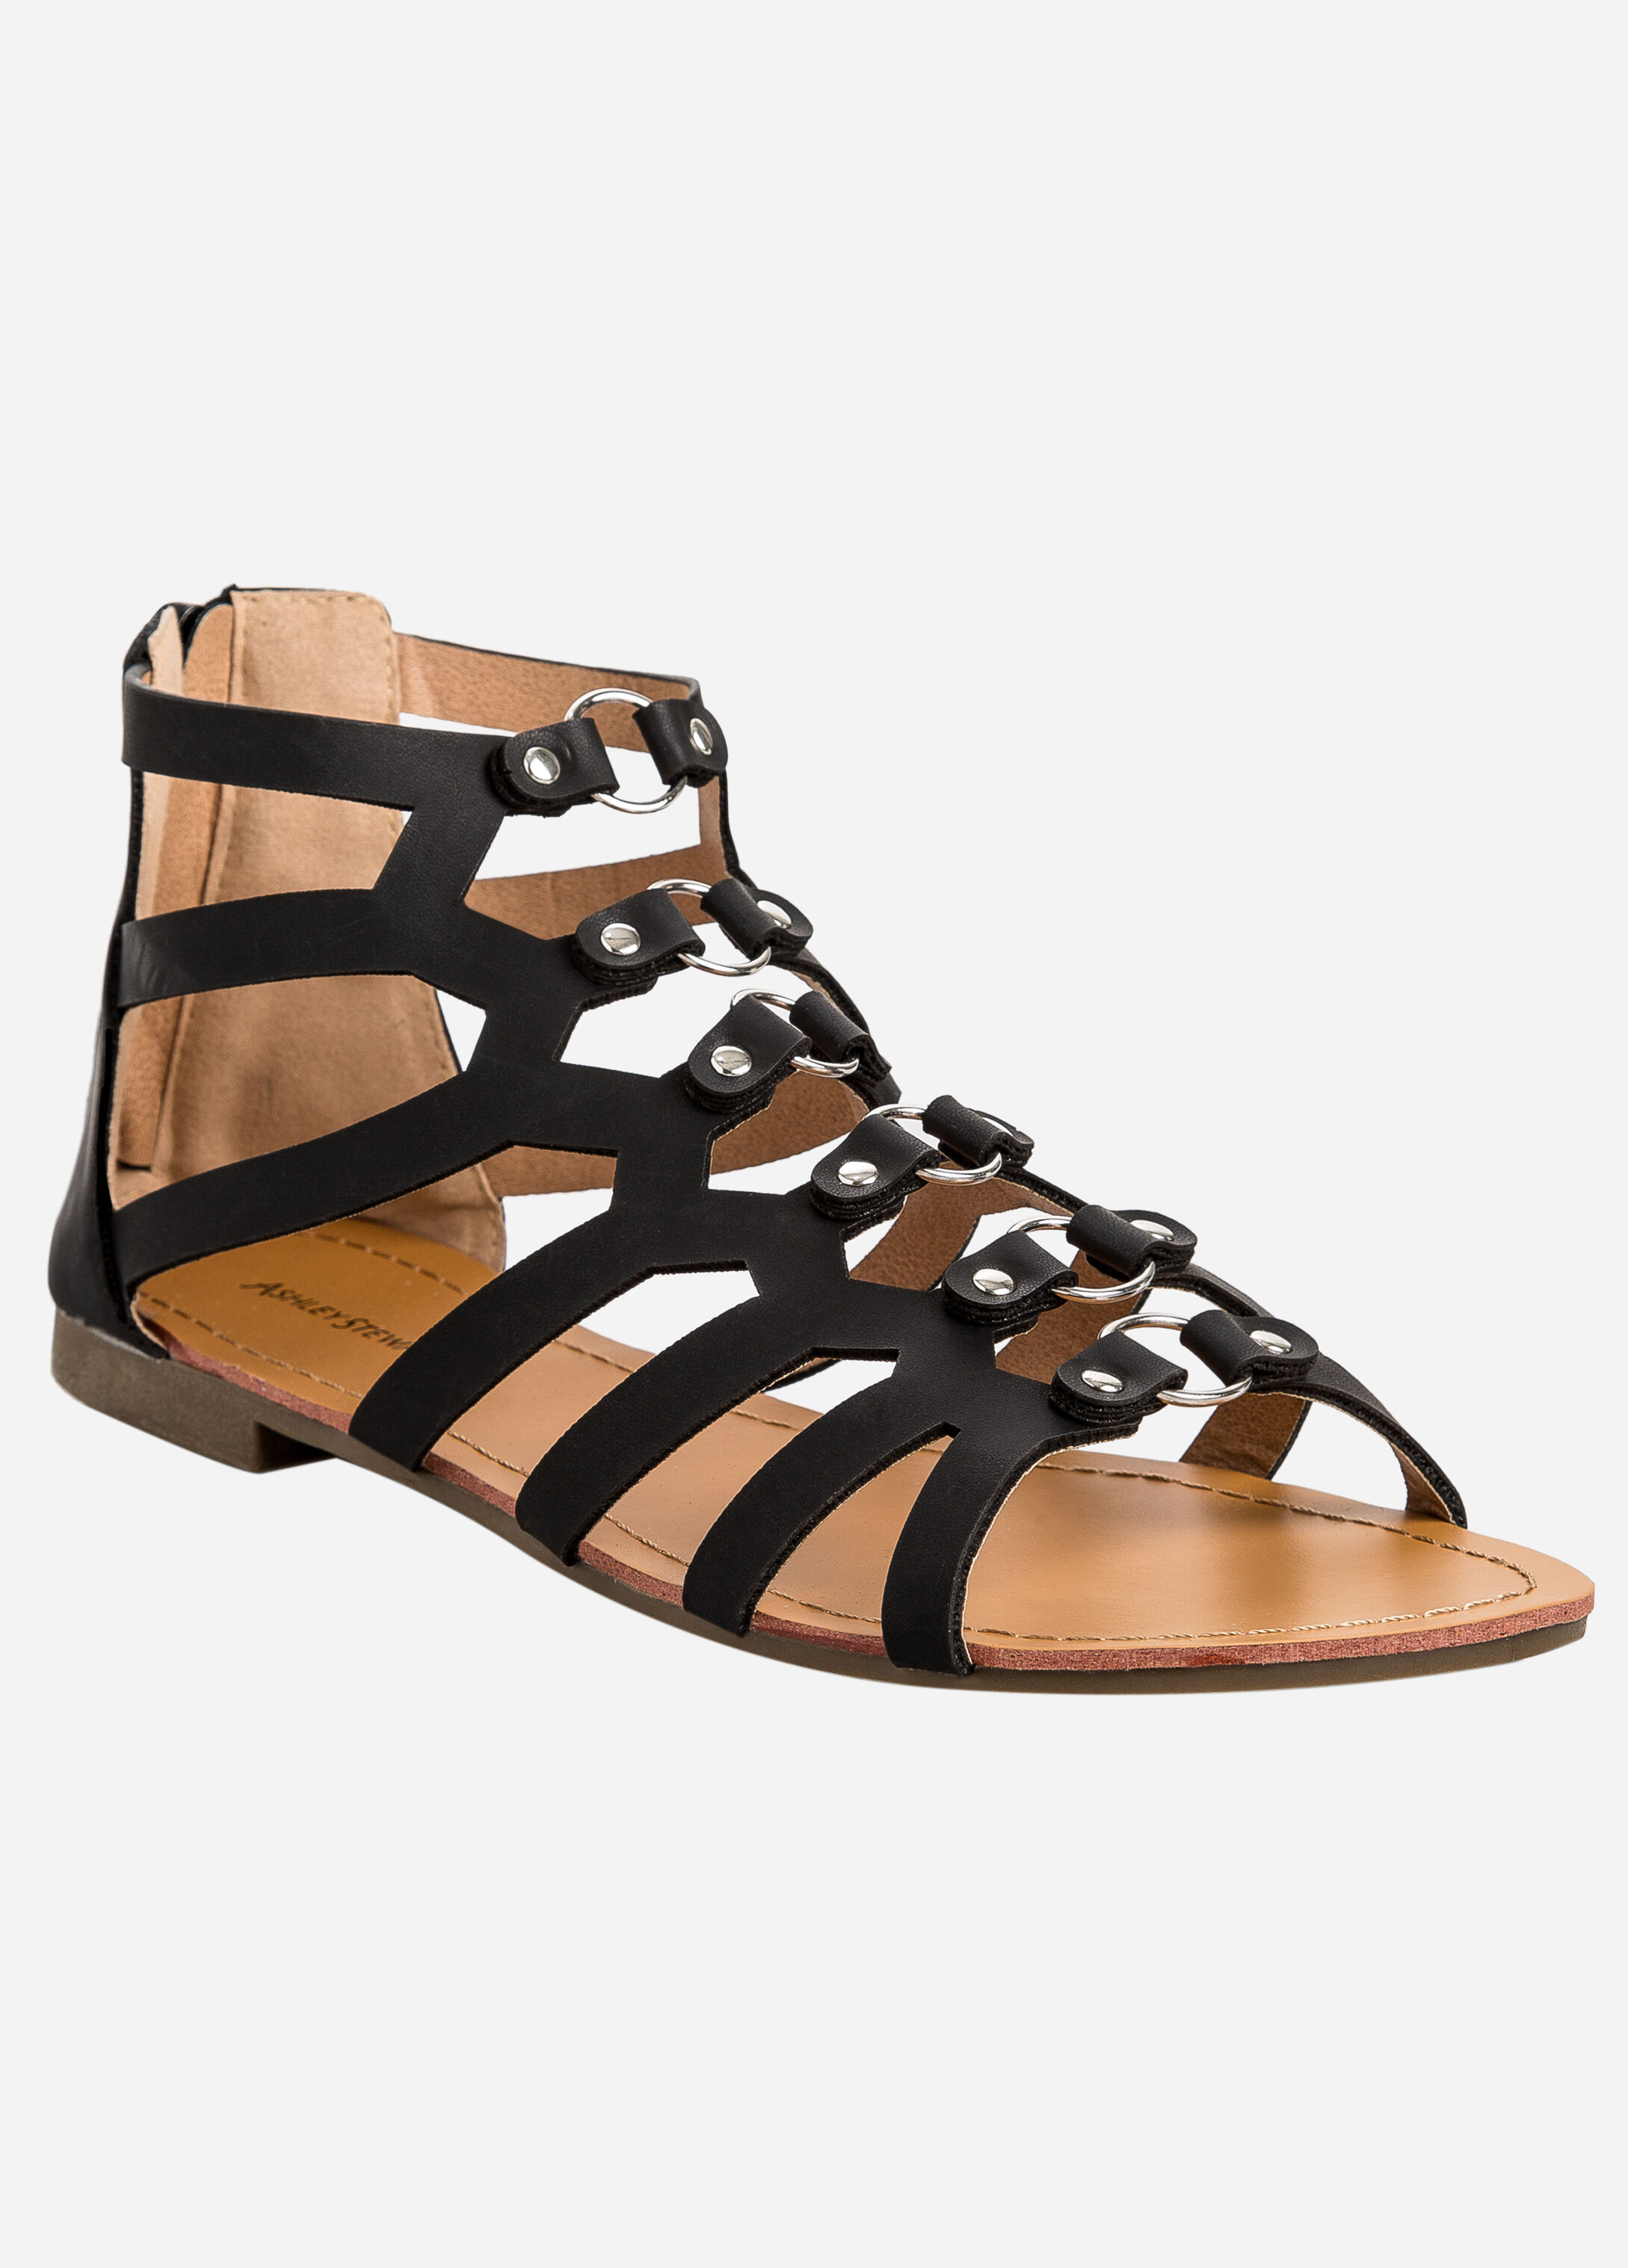 Wide Width Shoes   Wide Shoes for Women   Plus Size Shoes   Ashley ...